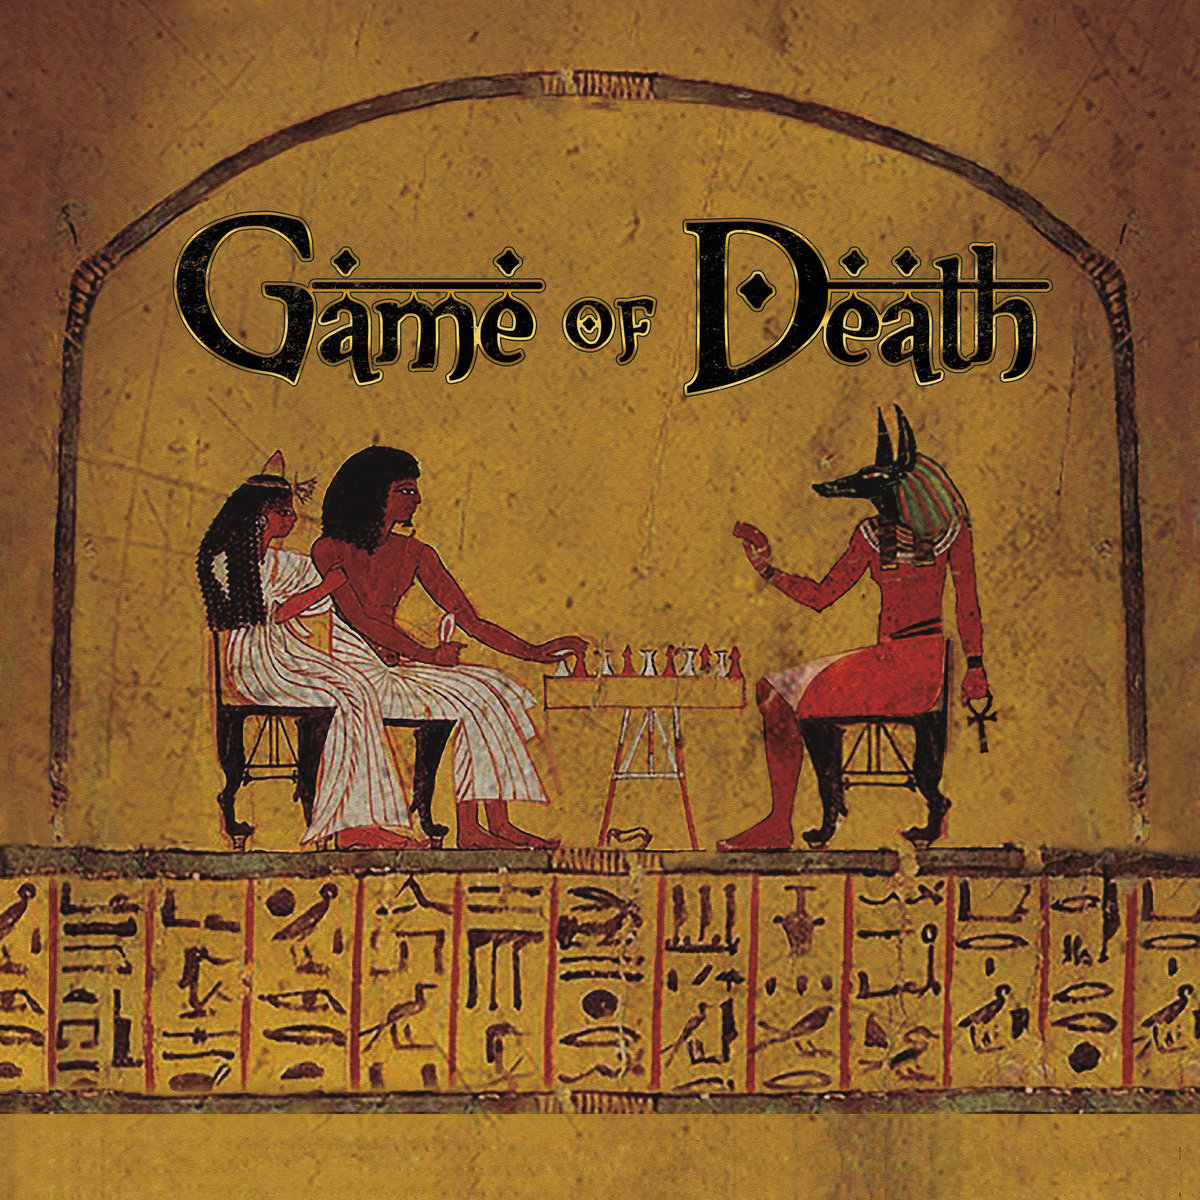 GENSU DEAN & WISE INTELLIGENT - GAME OF DEATH LP Review